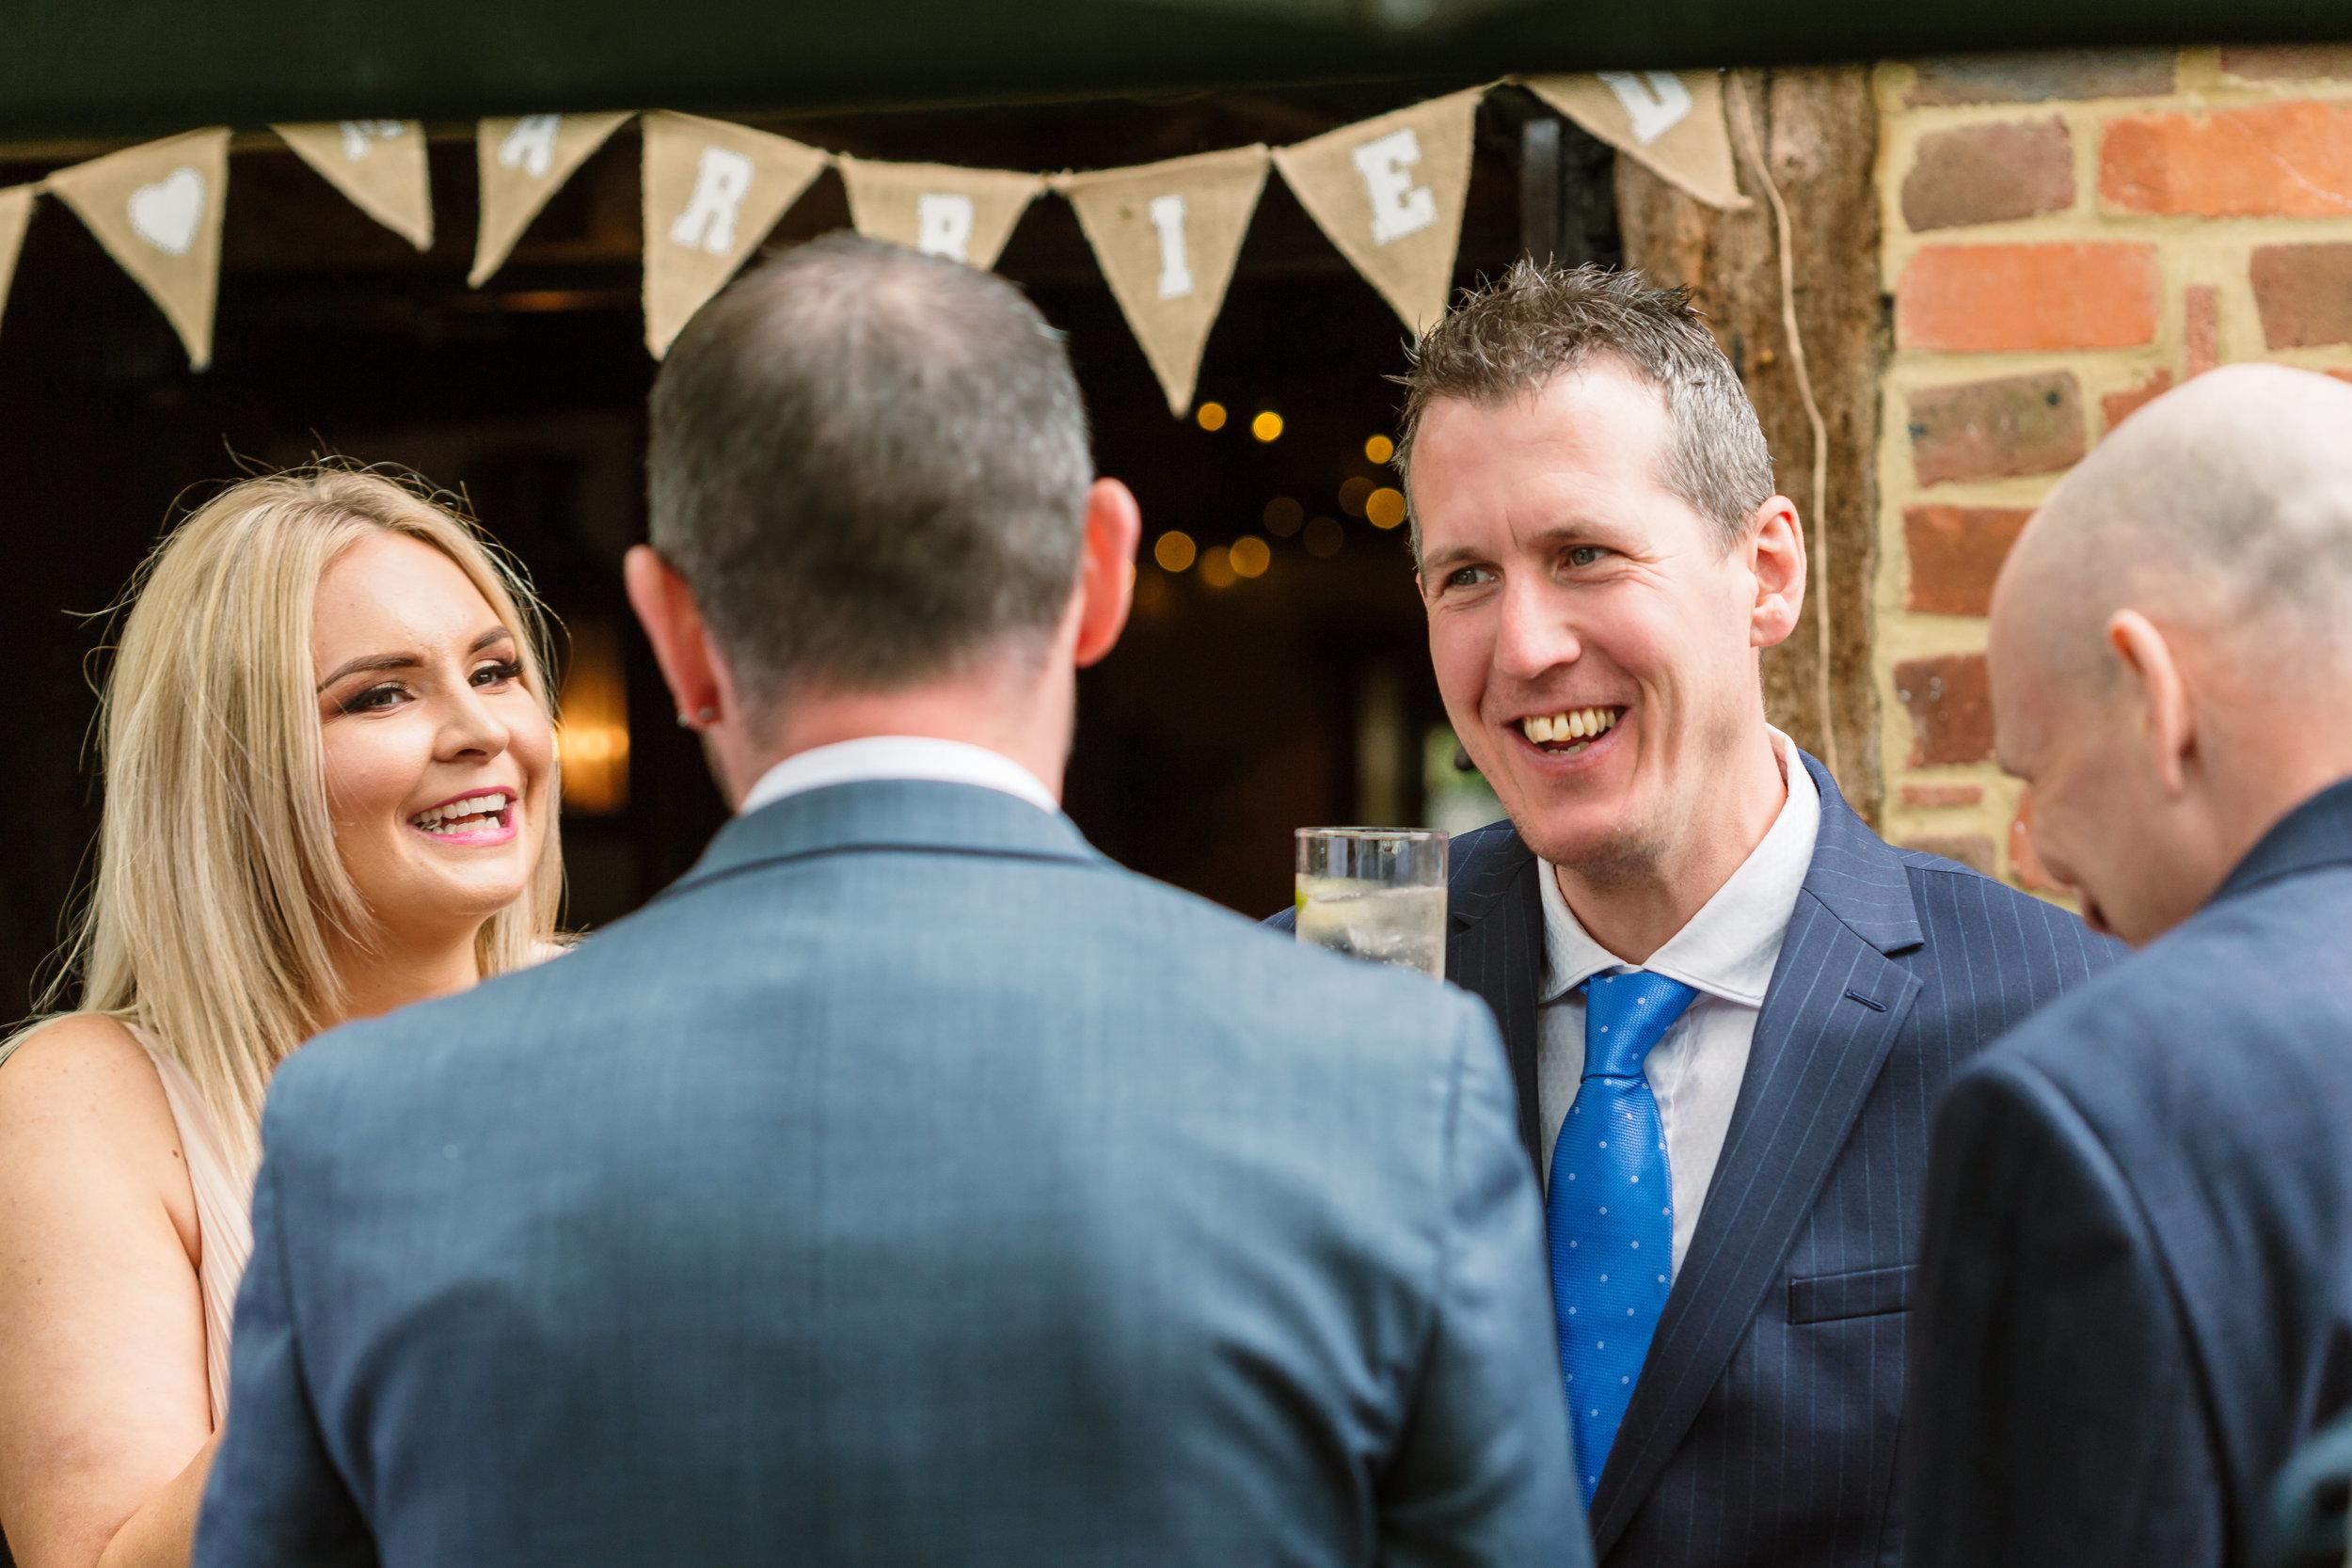 Sarah-Fishlock-Photography : Hampshire-wedding-photographer-hampshire : fleet-wedding-photographer-fleet : Meade-Hall-Wedding-Photographer : Meade-Hall-Wedding-Photos-618.jpg